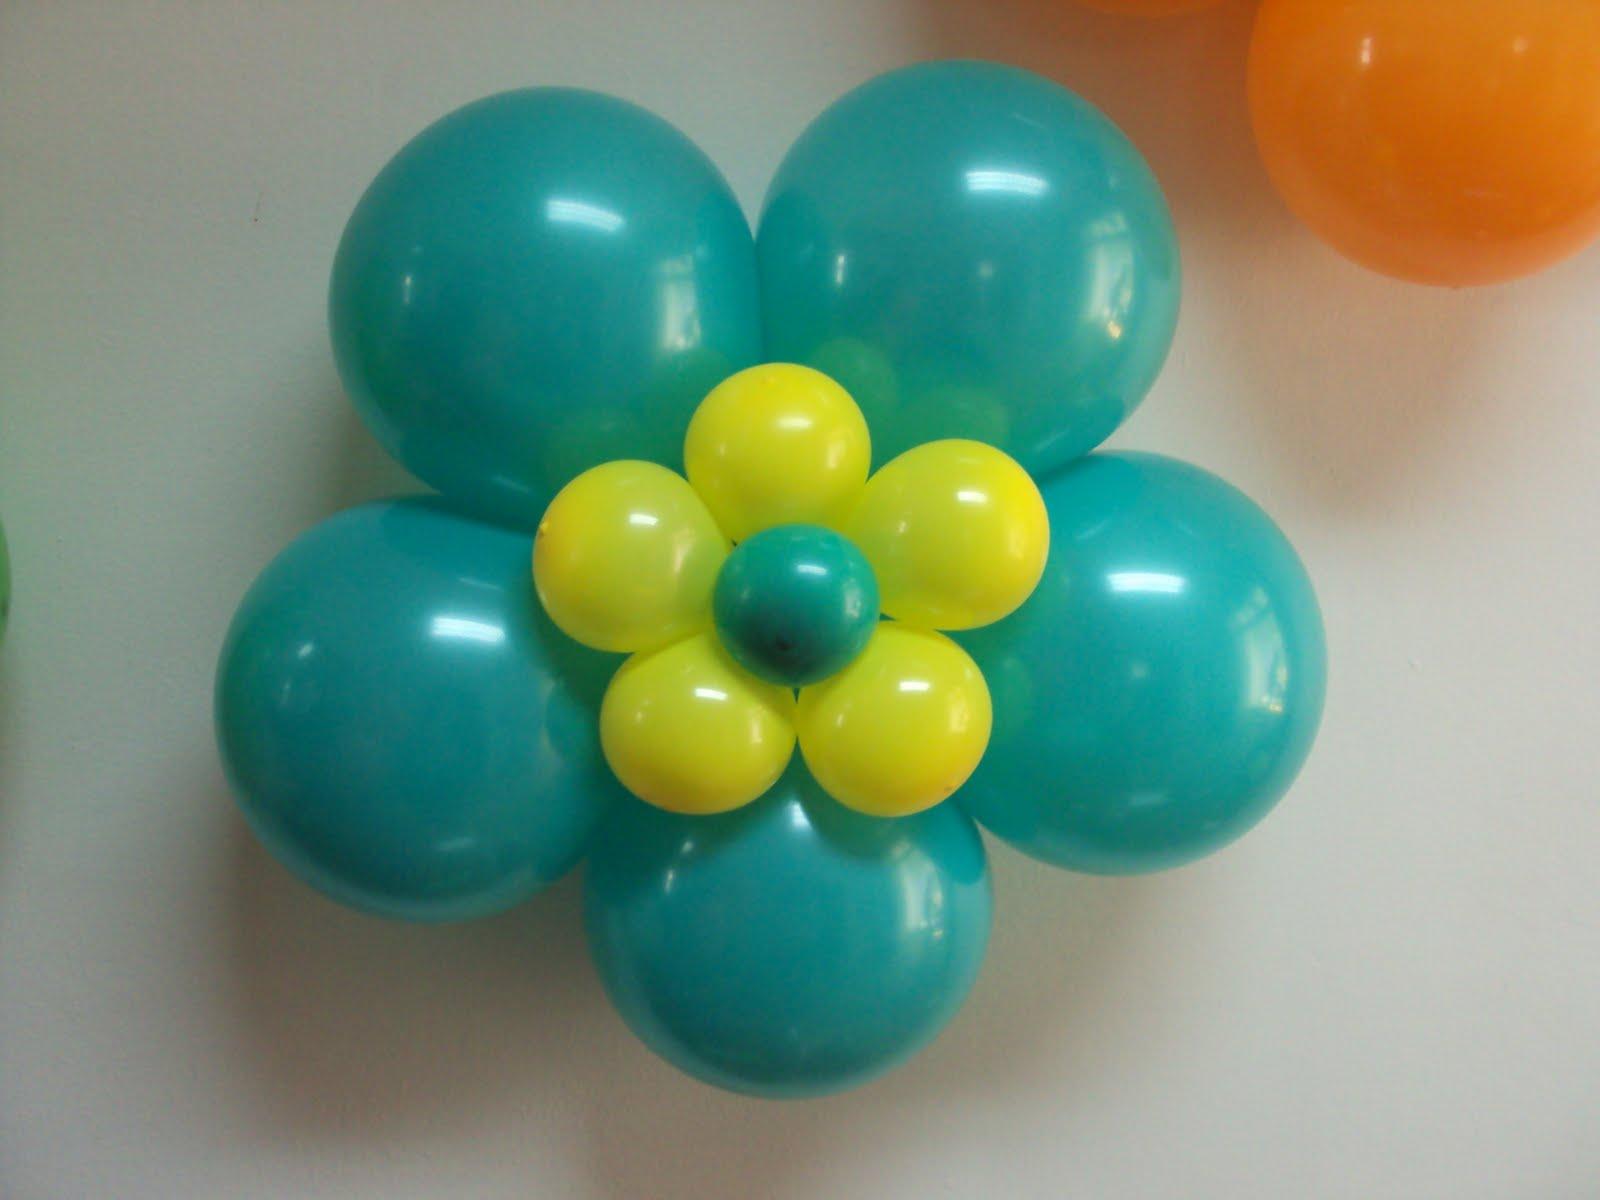 Decora tu fiesta con globos - Decora con globos ...